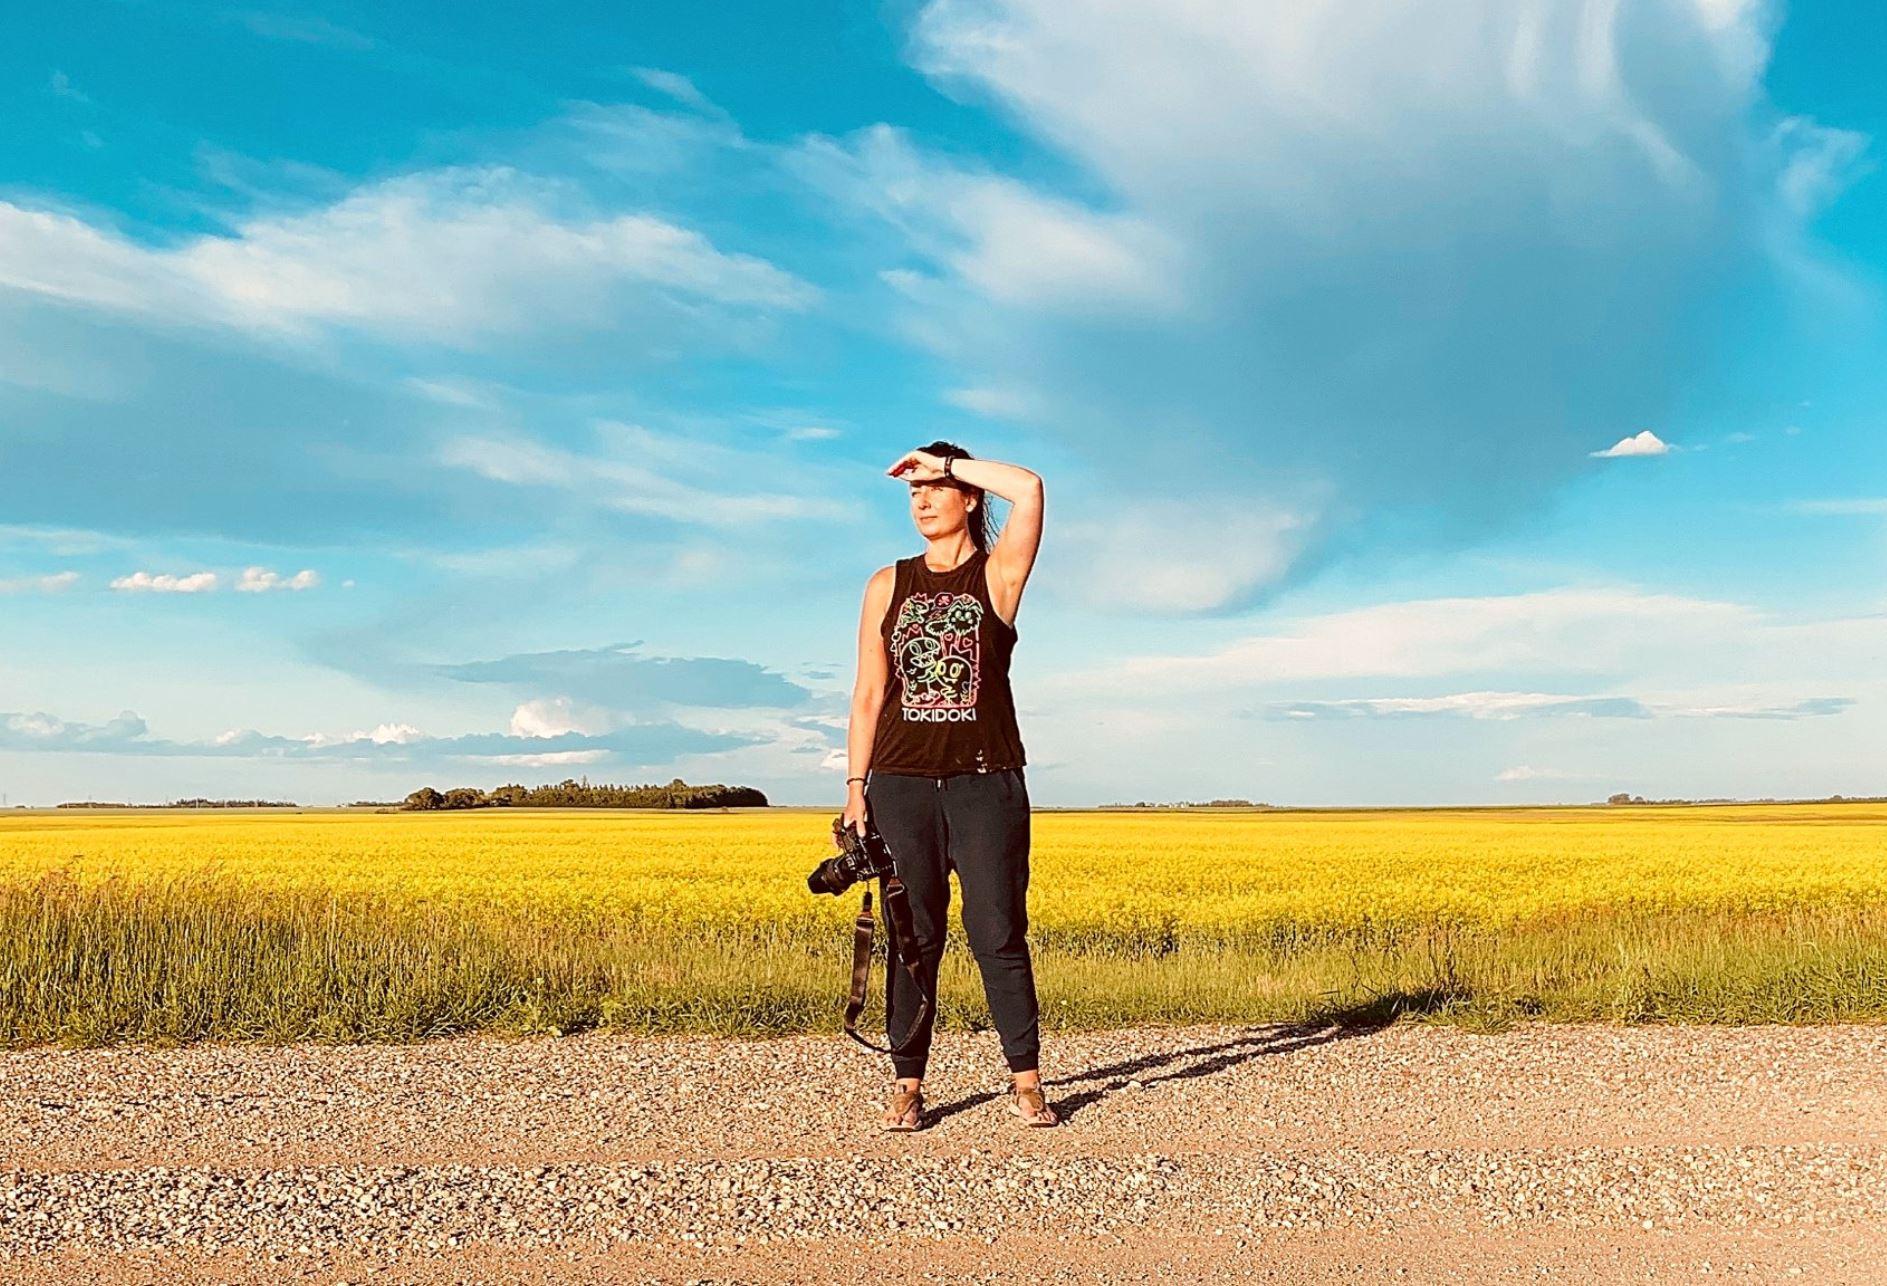 canadian artist brandy saturley taking photos in Brandon, Manitoba